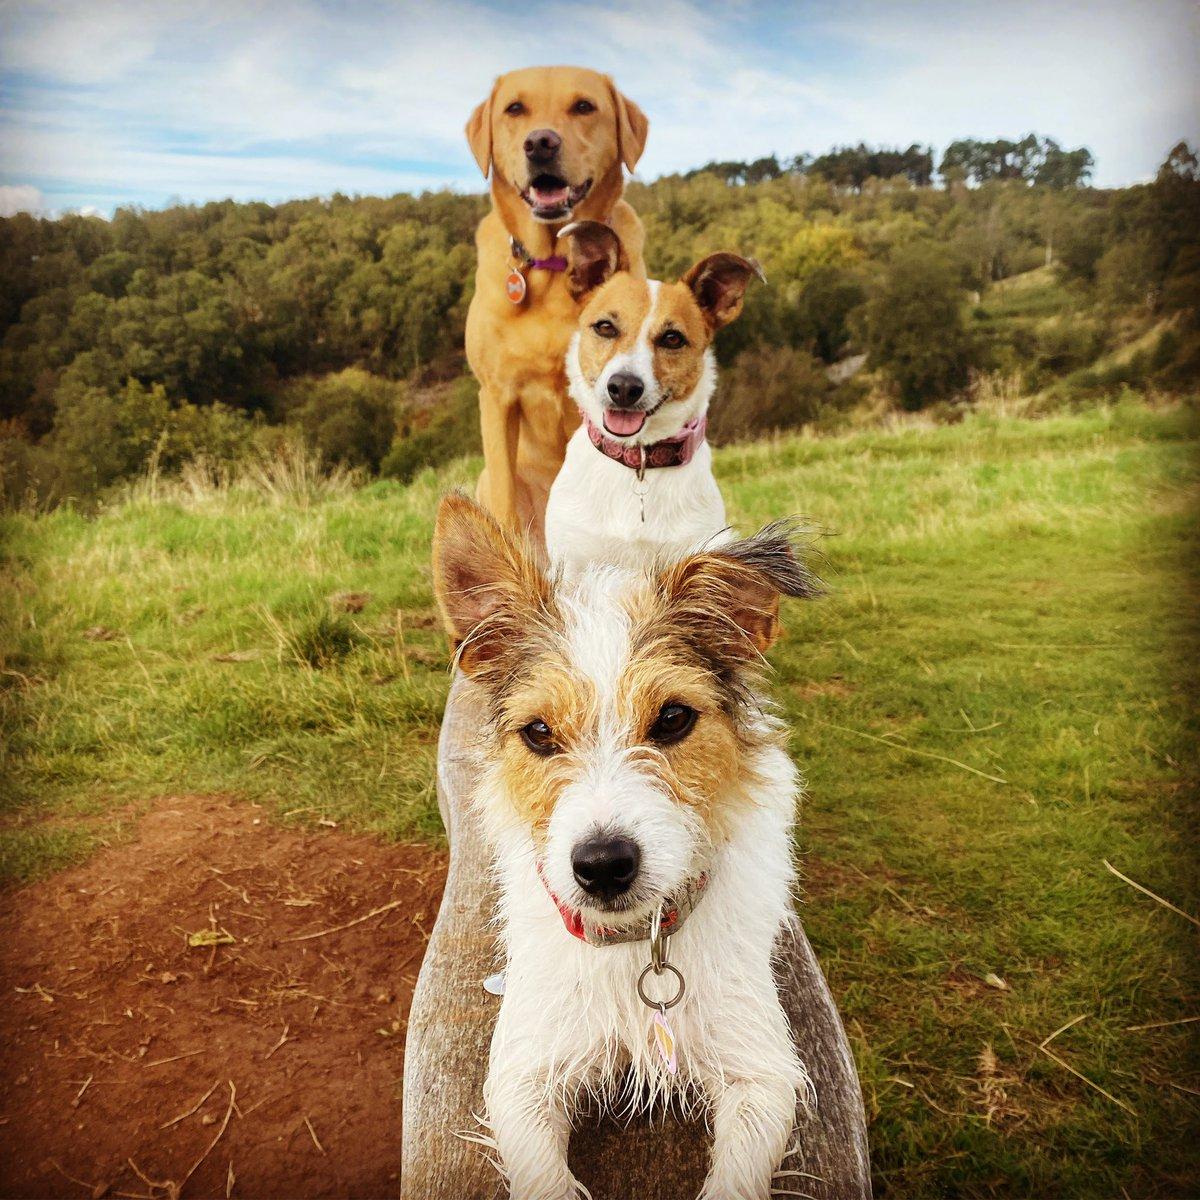 We love Scotland #Scotland #dogsofscotland #discoverscotland #wildscotland #dogsoftwitter #dogwalk #terriers #labrador #labradorretriever https://t.co/aggWvYjSIT